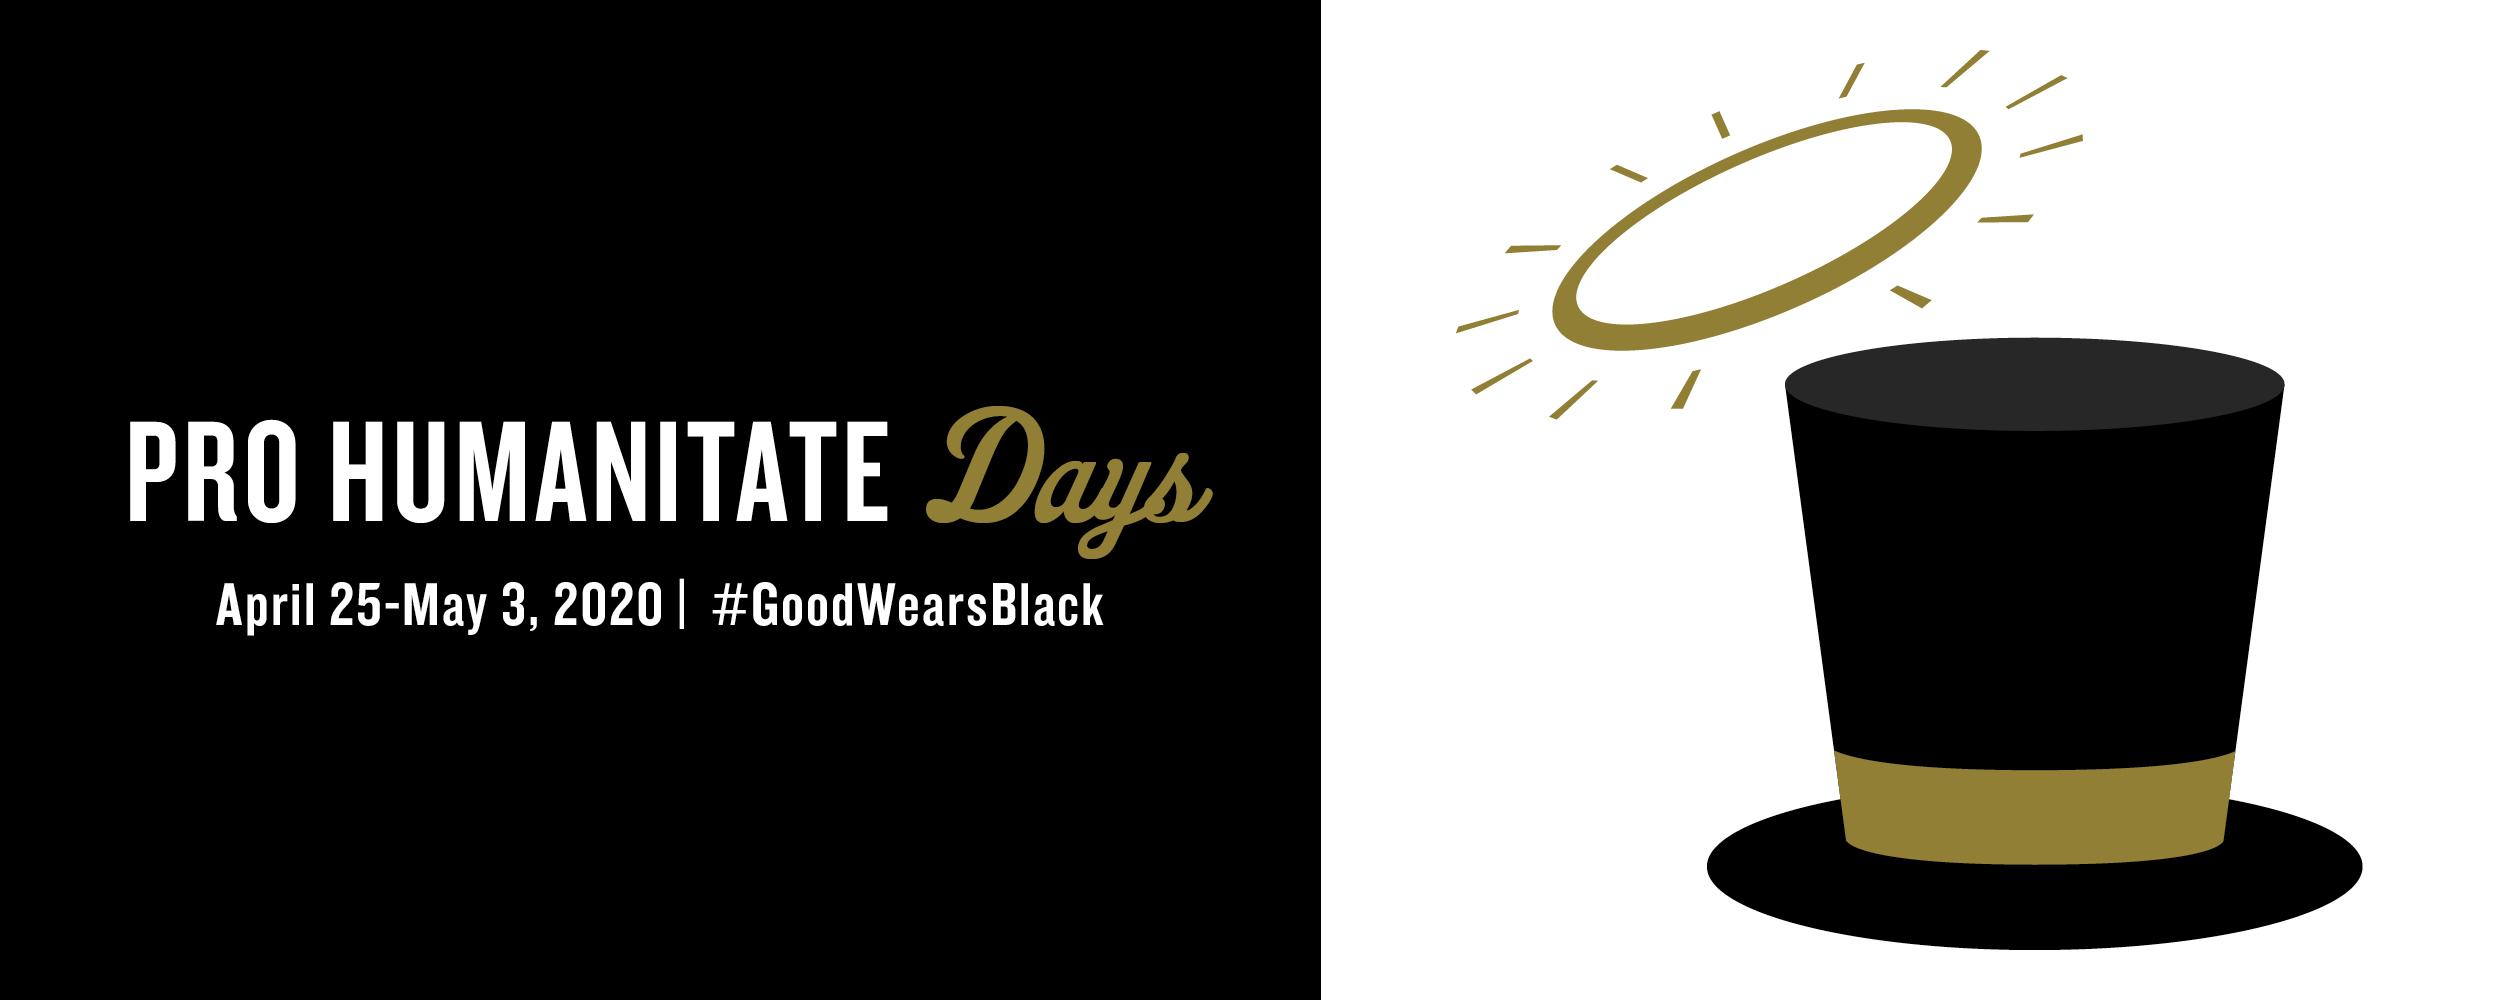 Pro Humanitate Days. April 25-May 3. #GoodWearsBlack